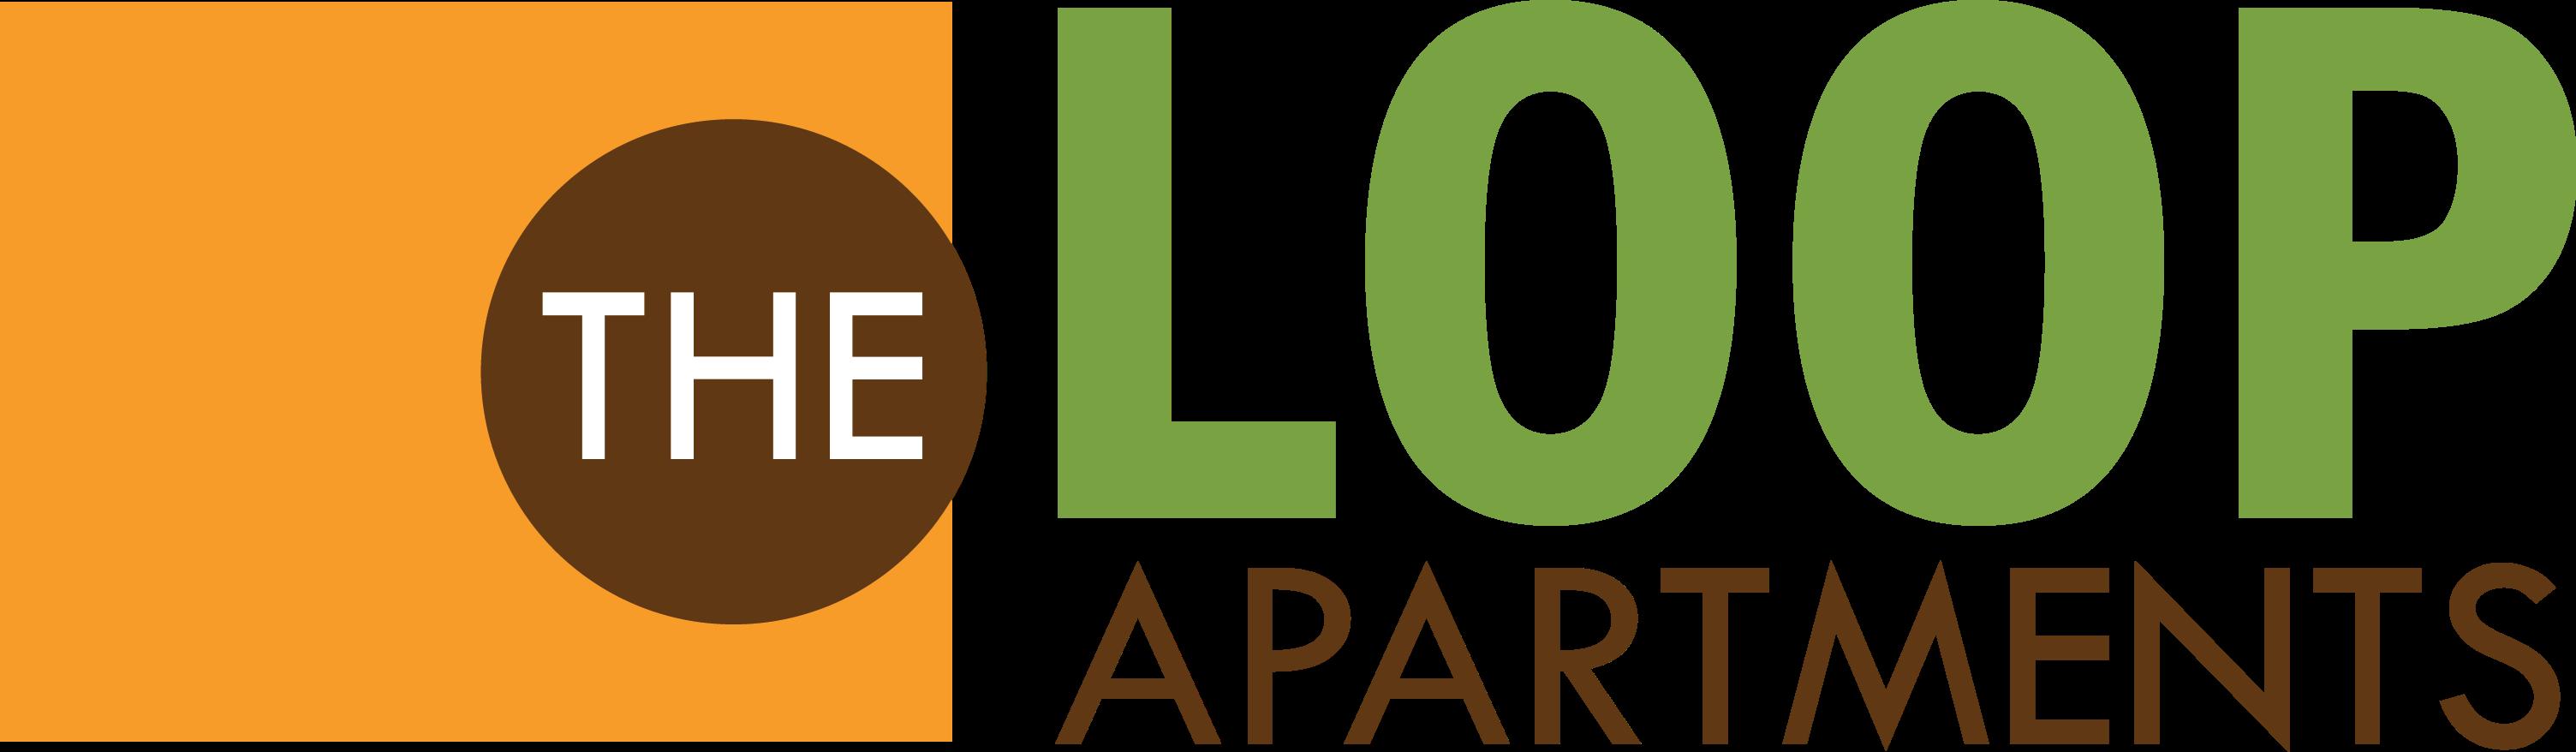 Kissimmee Property Logo 32